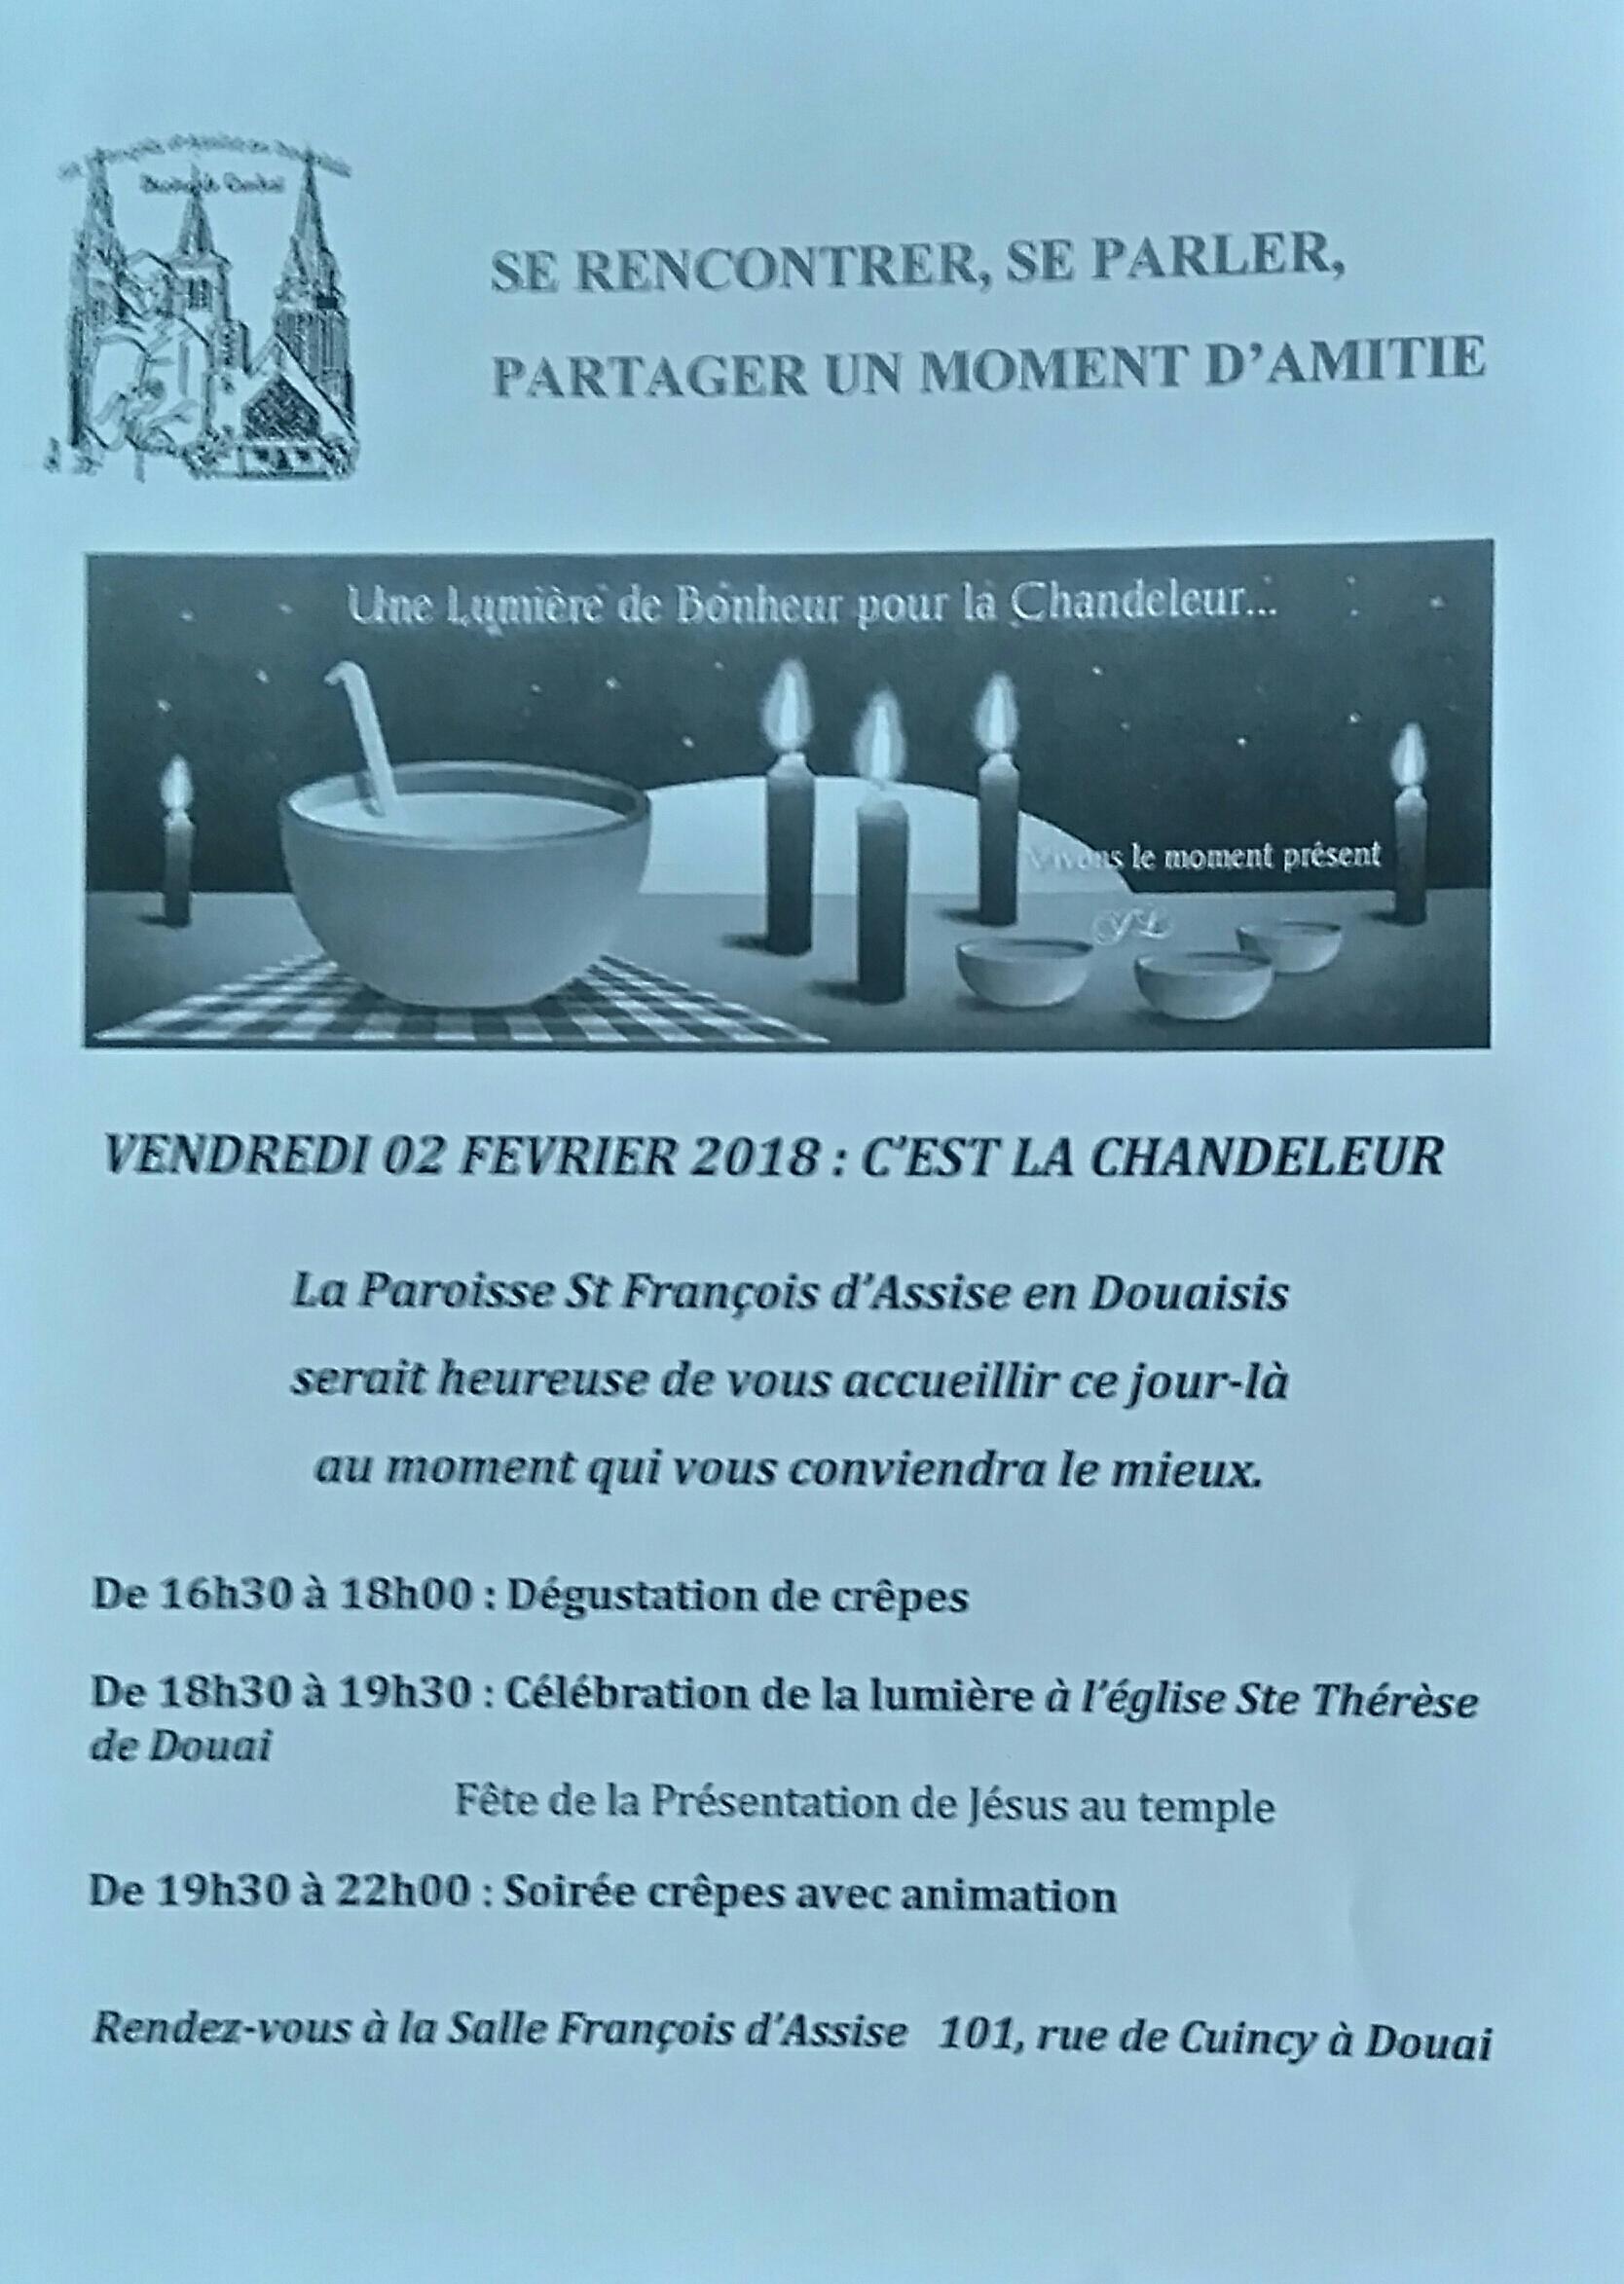 2 fevrier St Francois